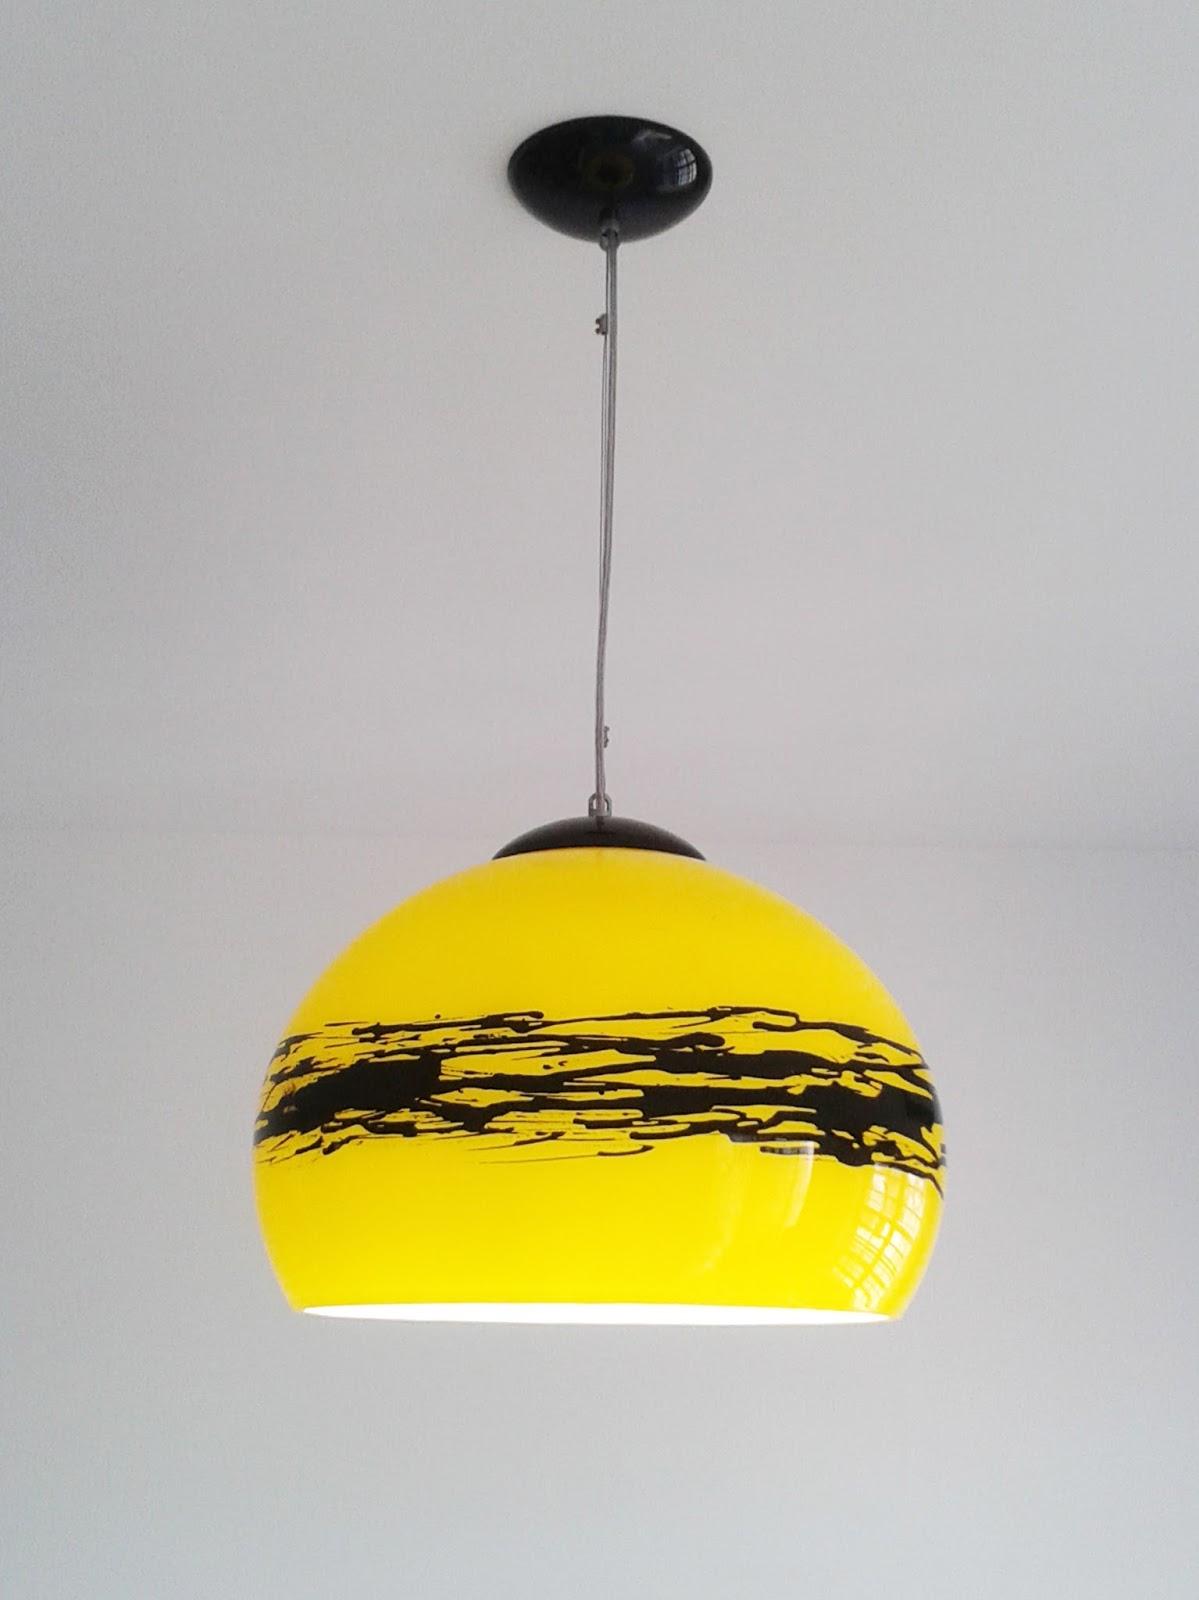 Ludica iluminacion lamparas de acrilico de techo colgantes for Modelos de lamparas